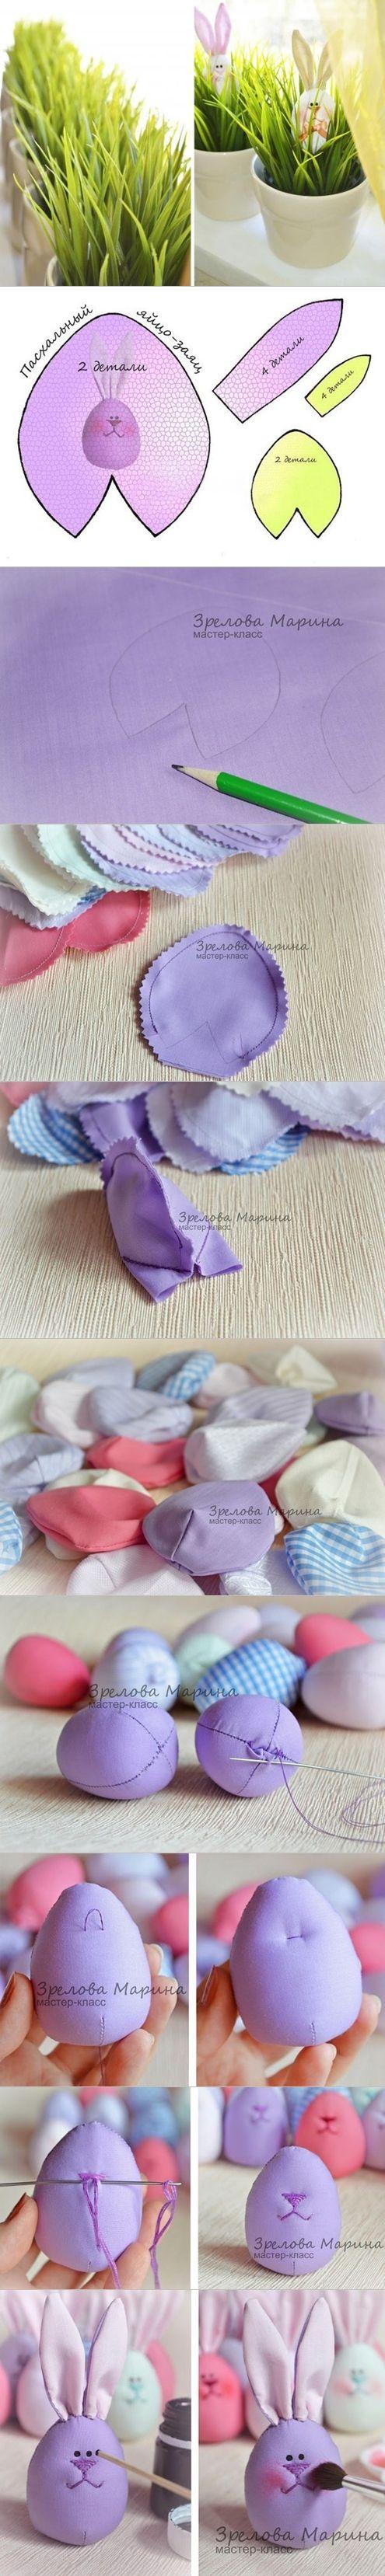 DIY Cute Fabric Egg Bunny | www.FabArtDIY.com LIKE Us on Facebook ==> https://www.facebook.com/FabArtDIY